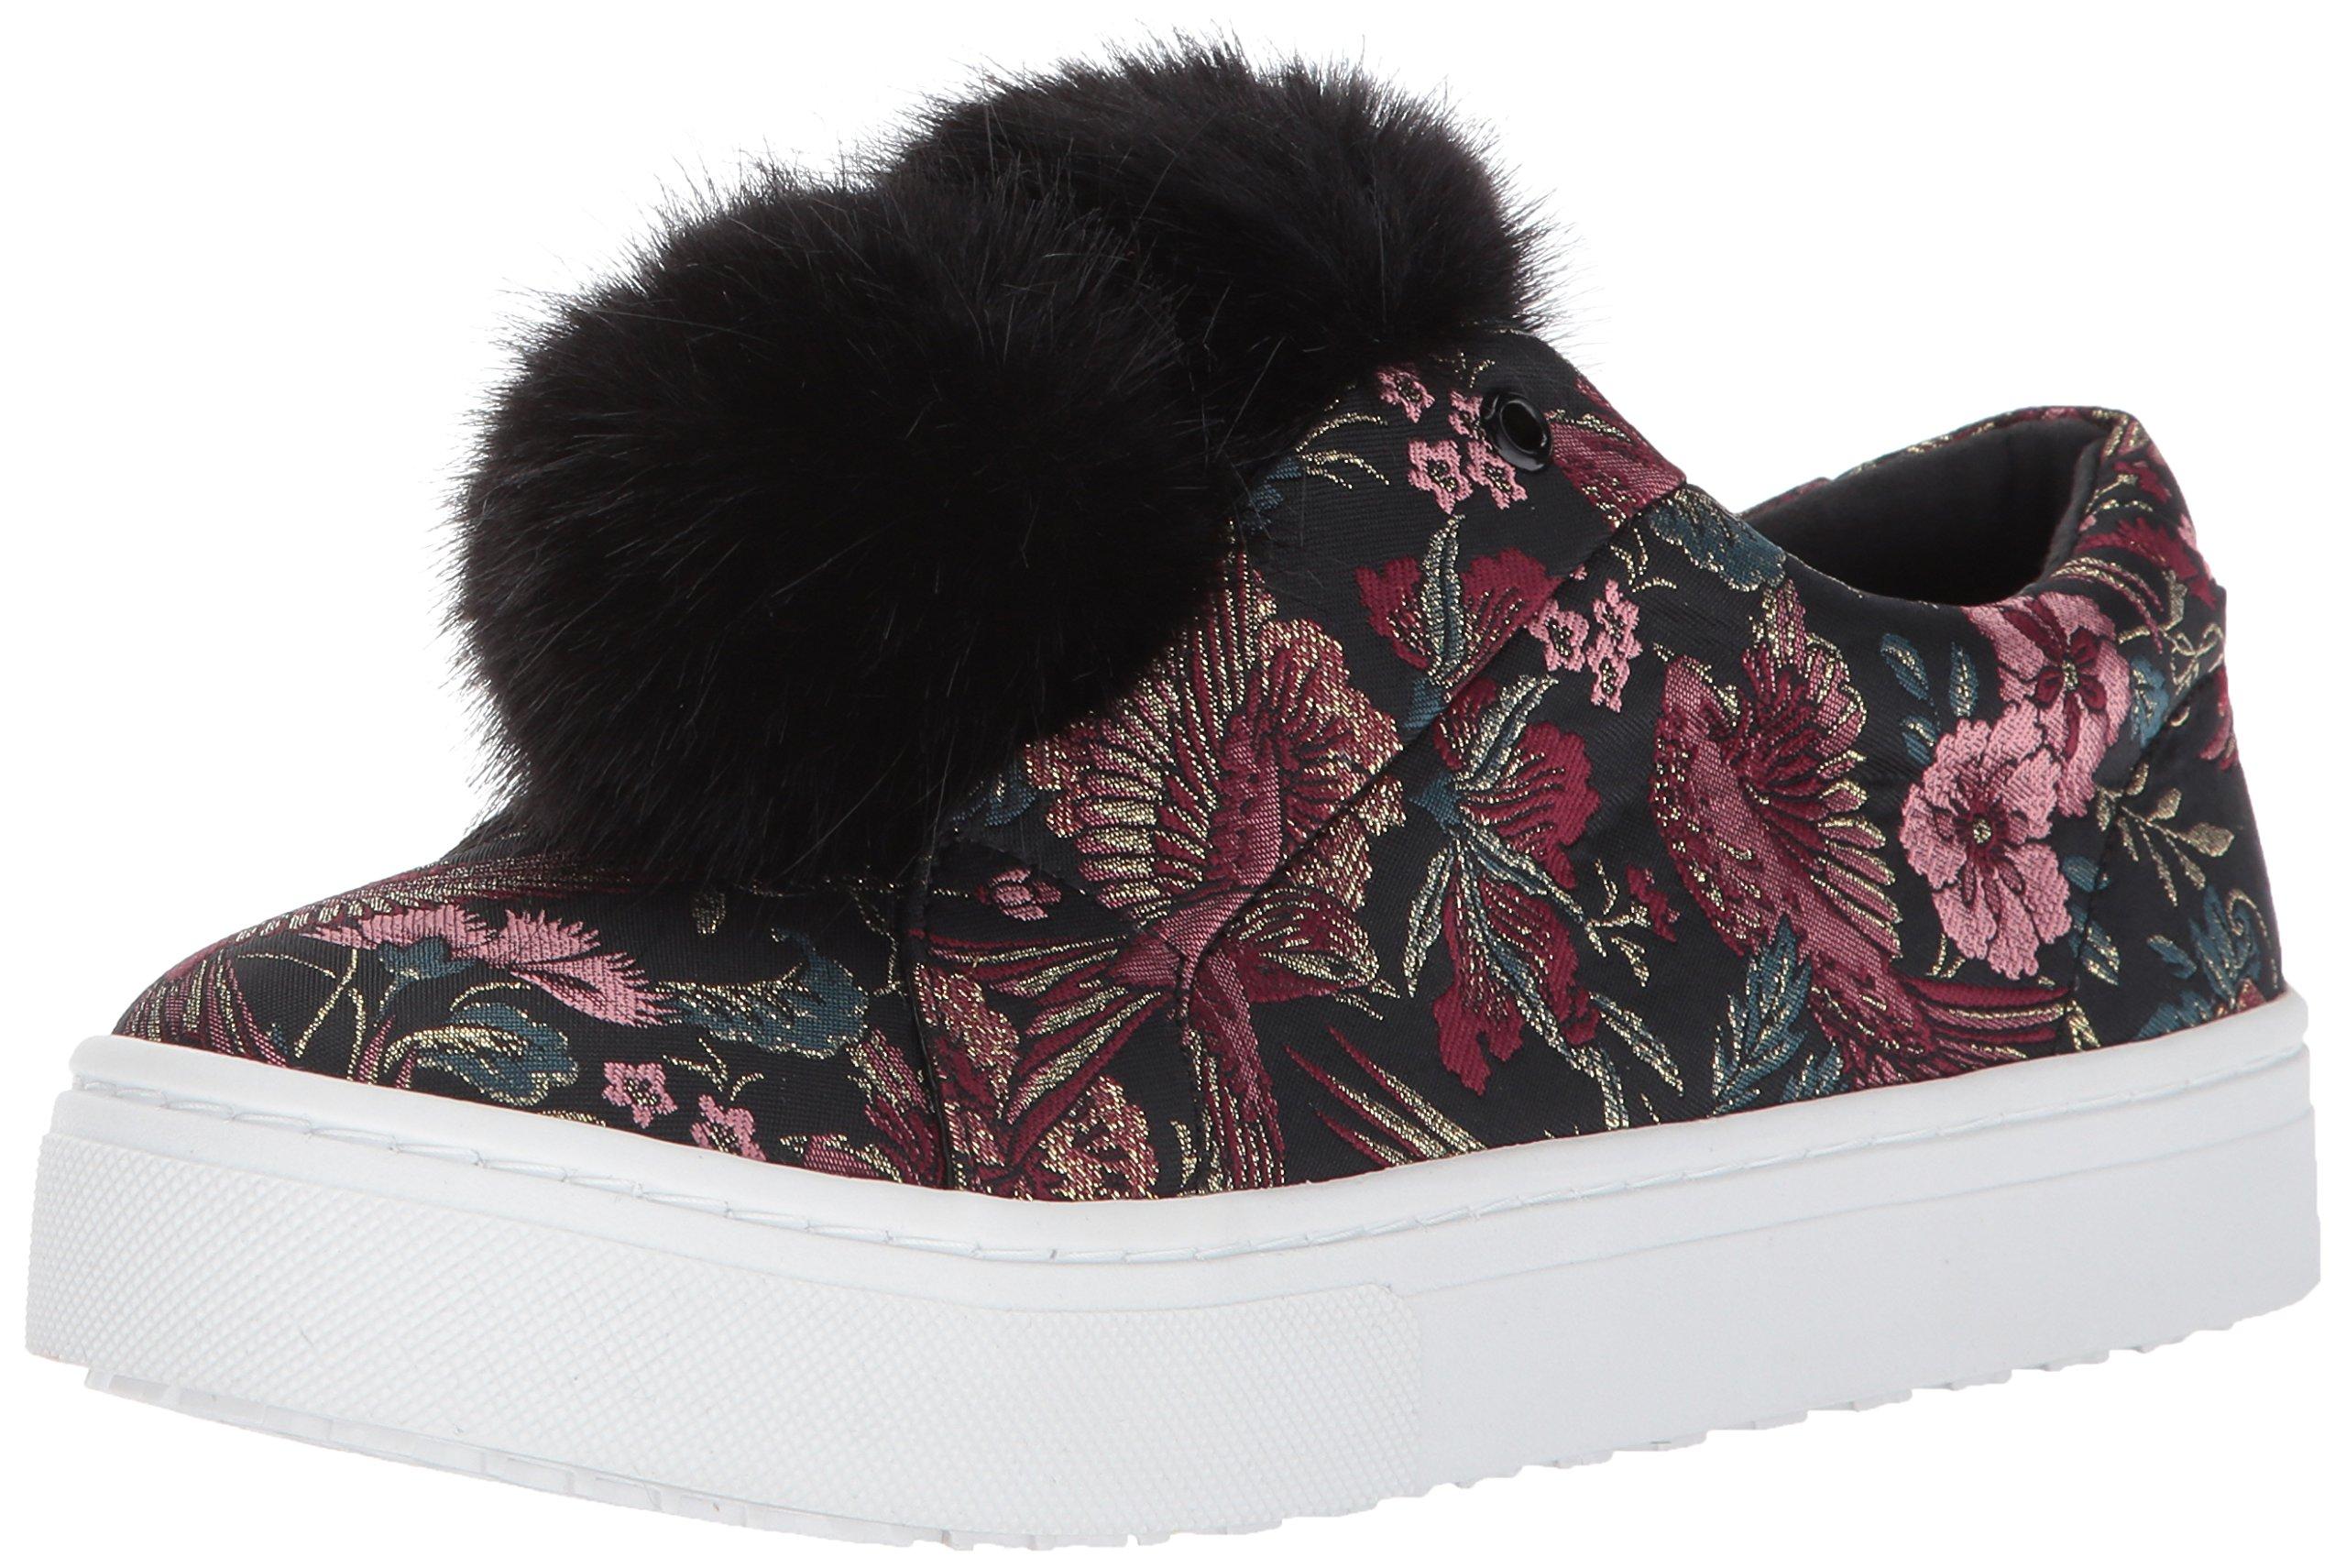 Sam Edelman Women's Leya Sneaker, Black/Multi Jacquard, 8.5 Medium US